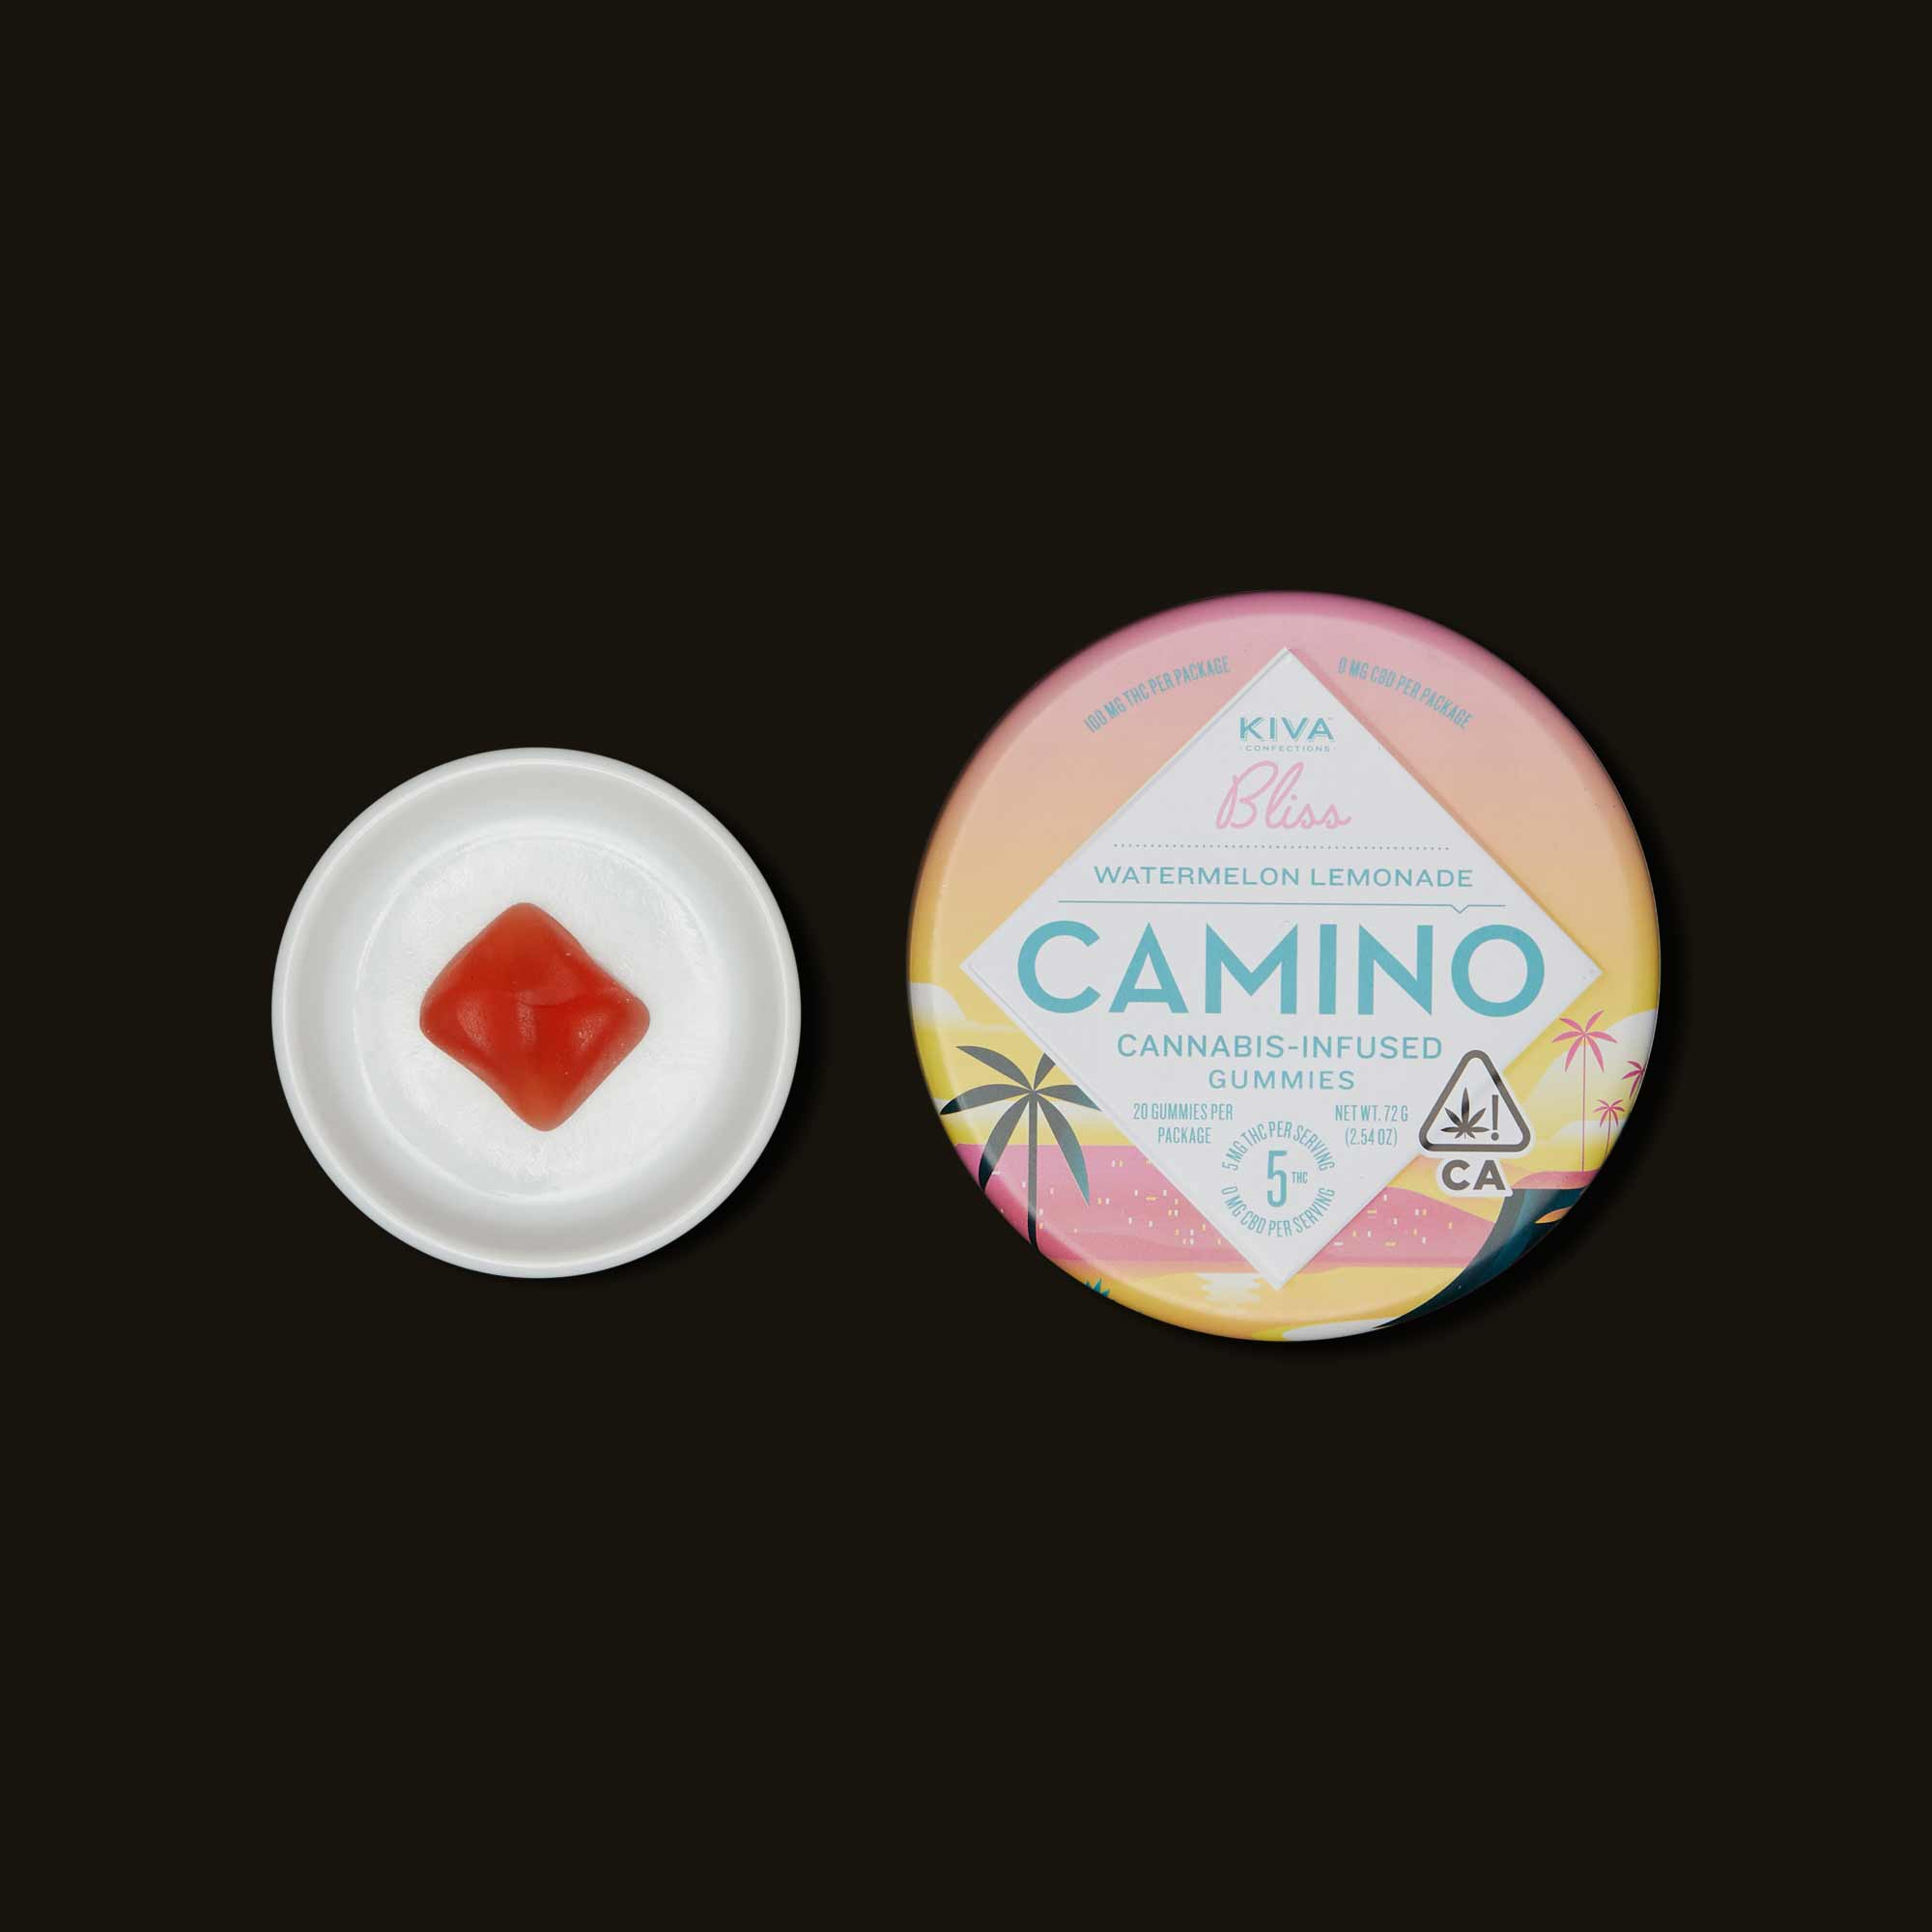 Kiva Confections Camino Watermelon Lemonade Gummies